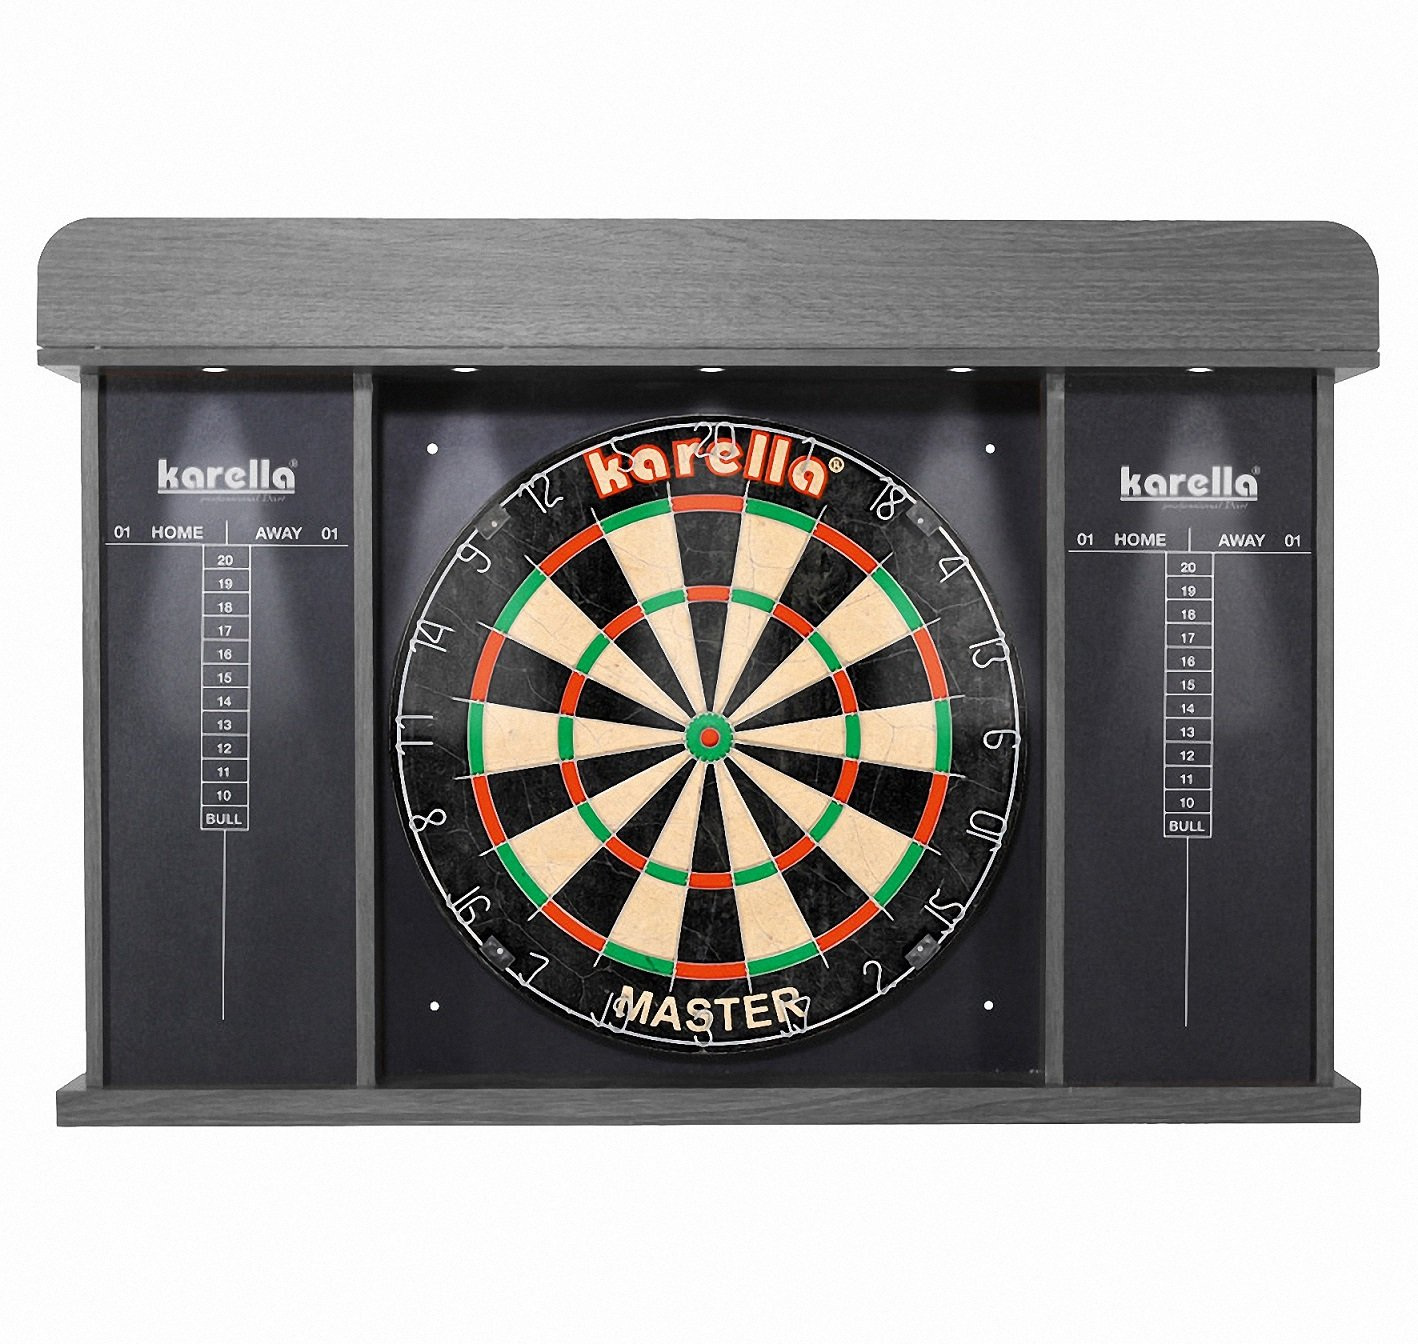 Dart Cabinett Cabinet Arena for Dartboards with Lighting and 3Kit Roleo Dartflys